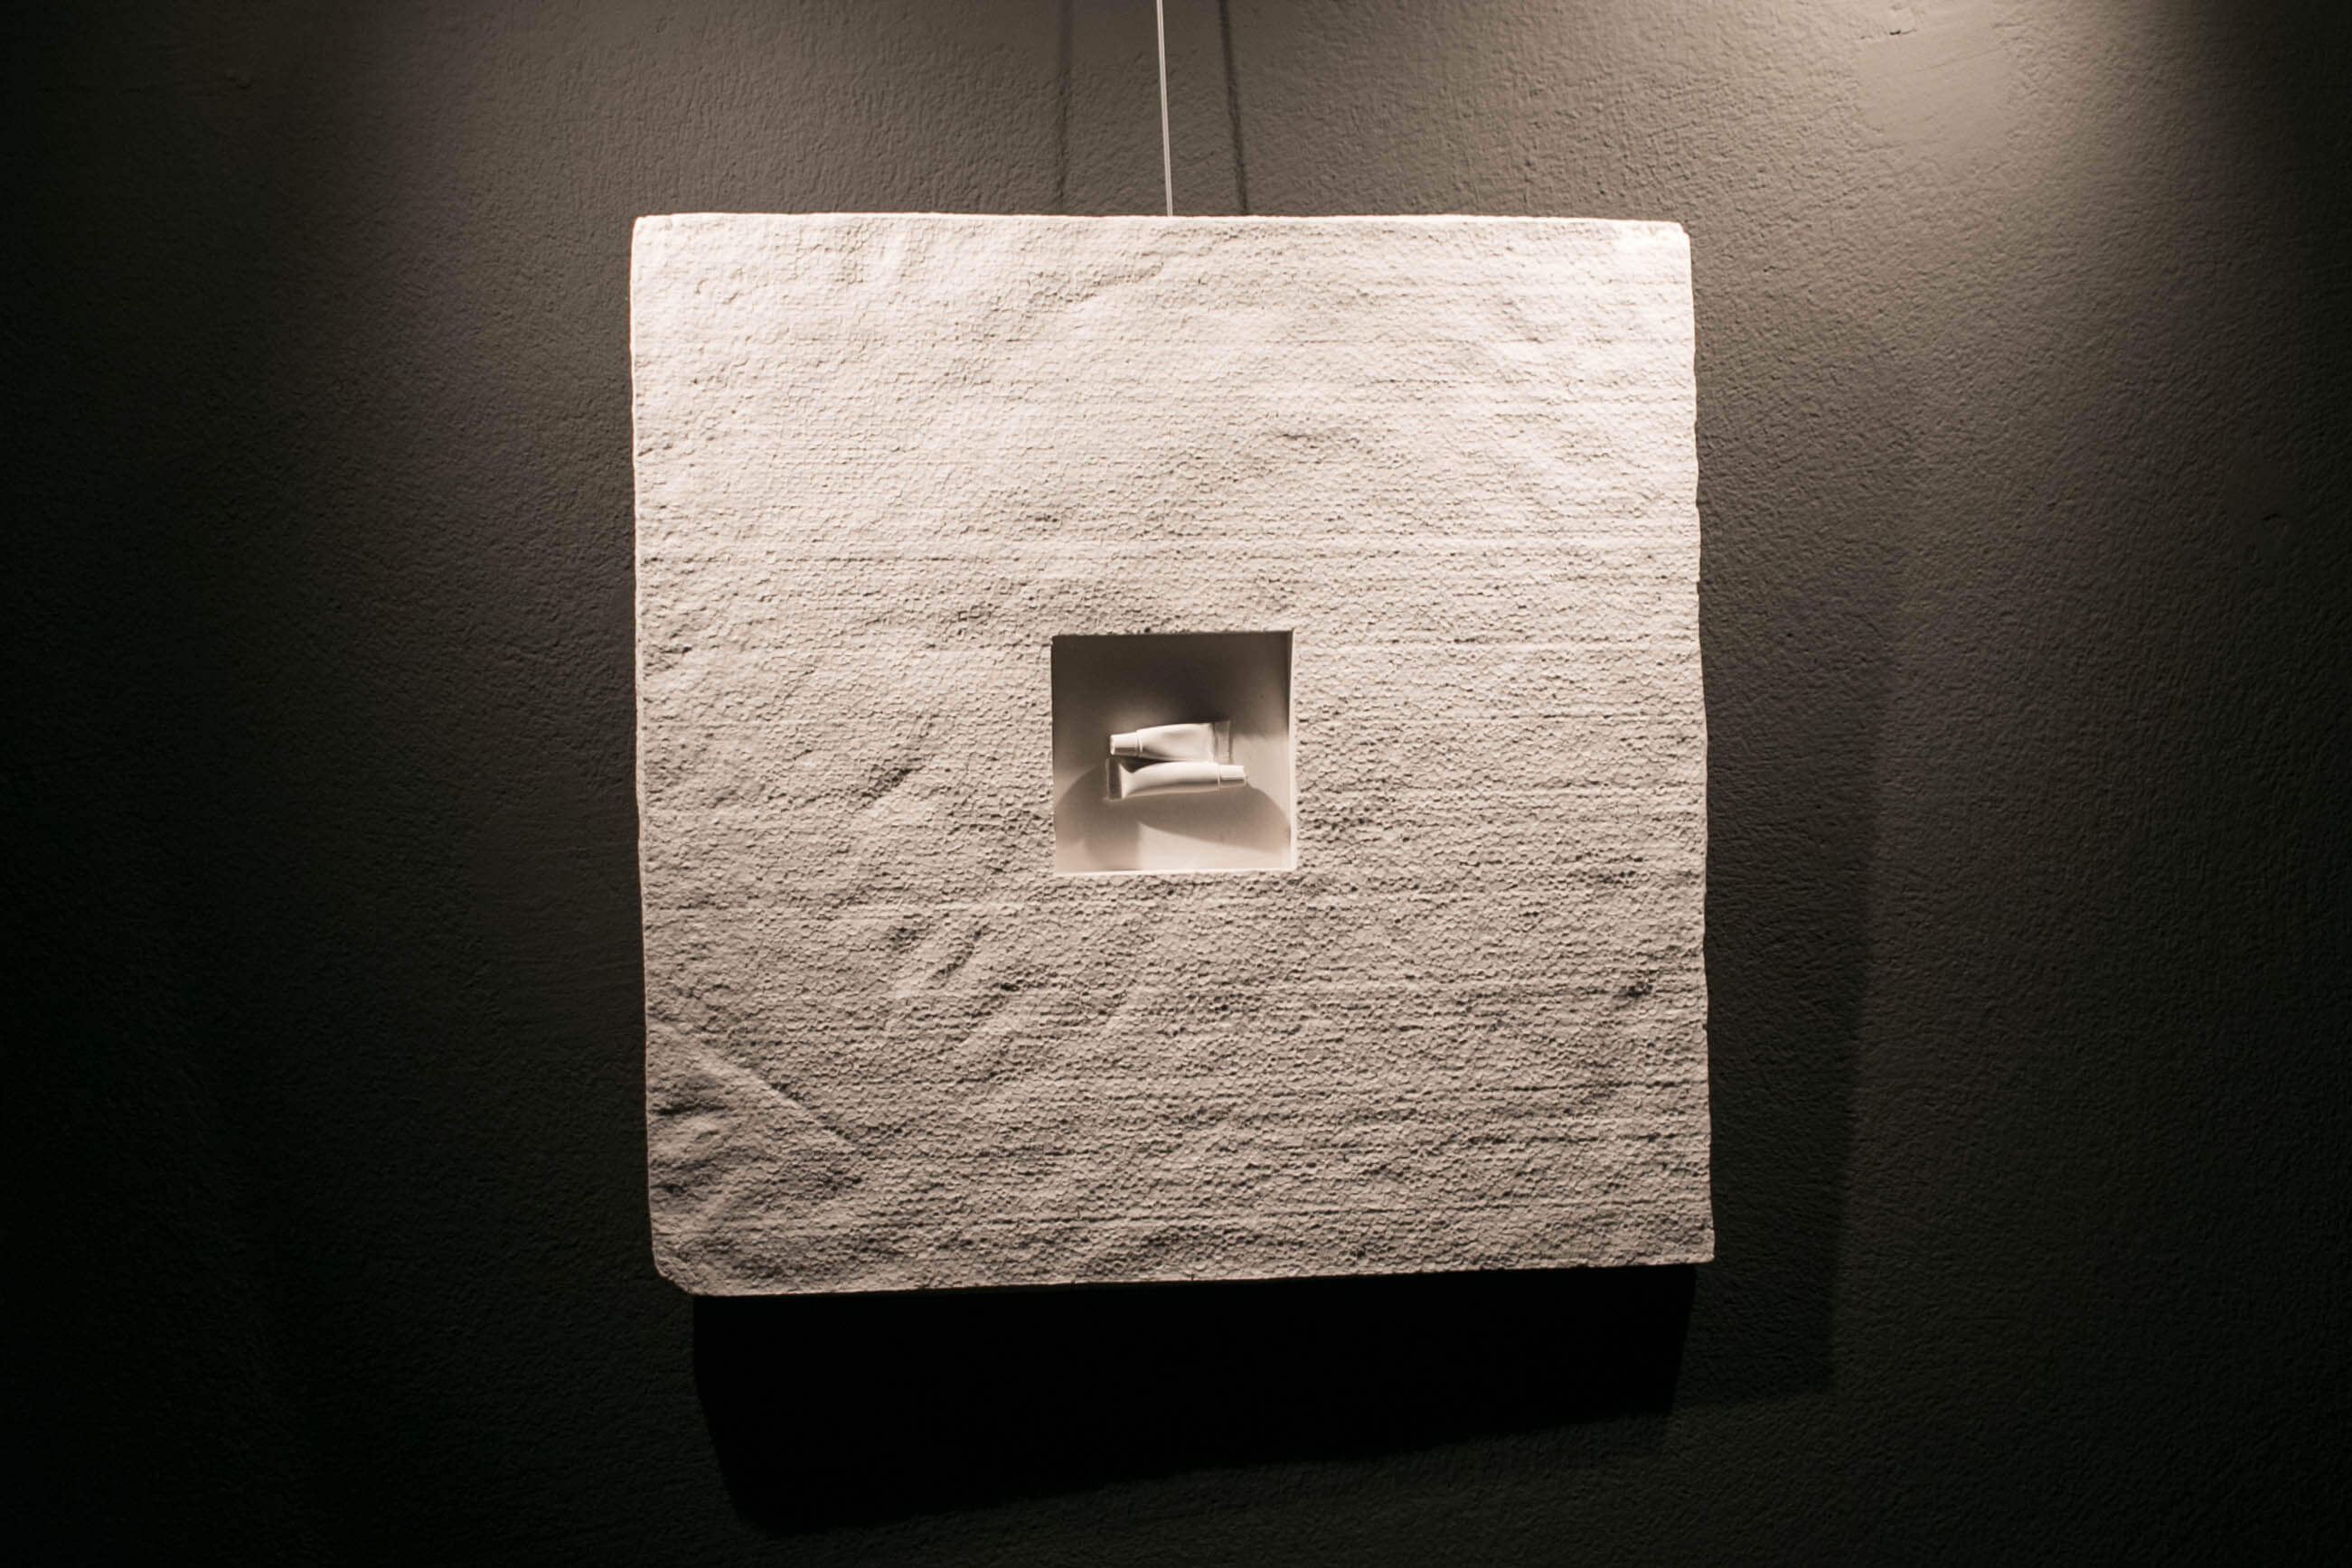 tubes_Meenan_art_relief_sculpture_IMG_2433.jpg